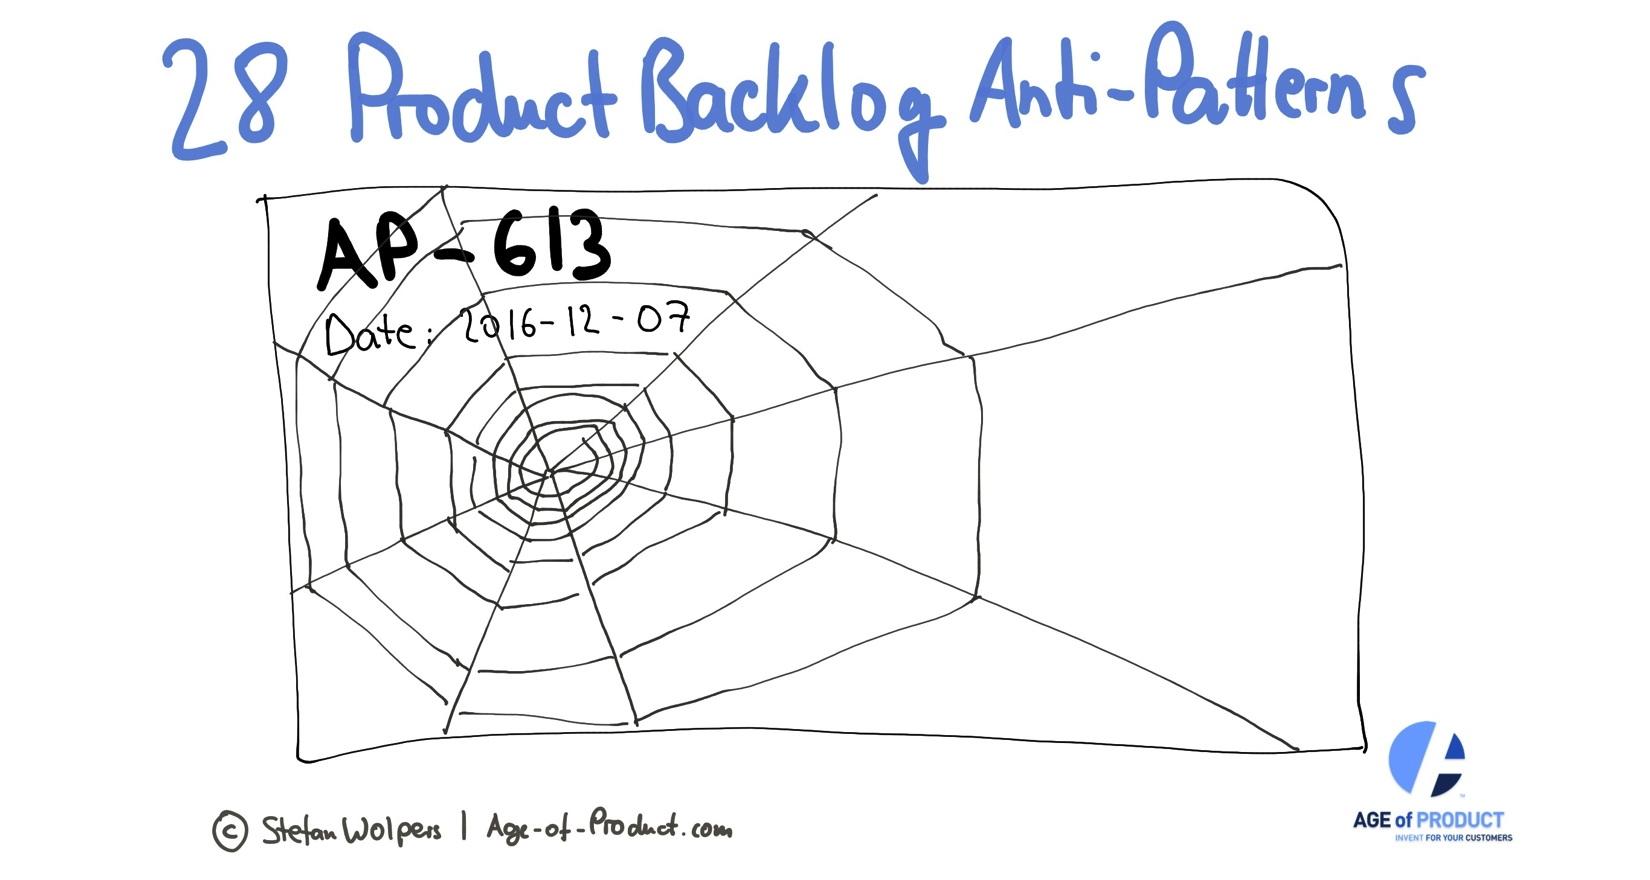 28 Product Backlog Anti-Patterns